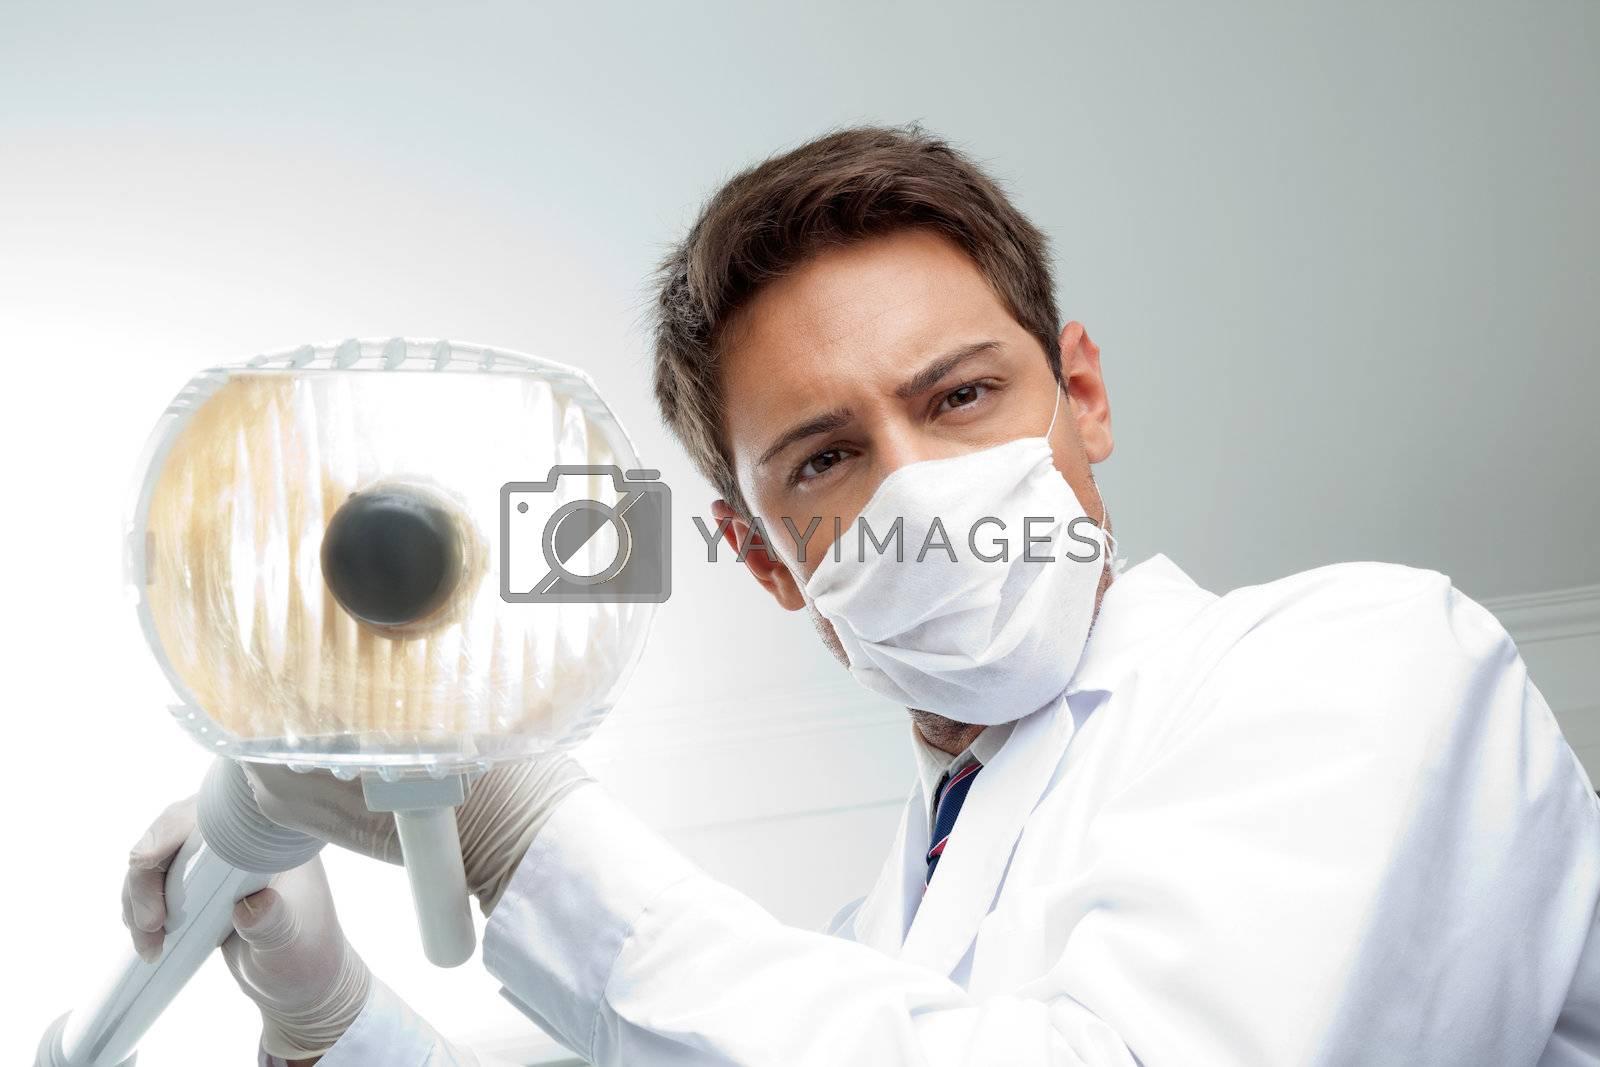 Dentist Holding Dental Lamp by leaf